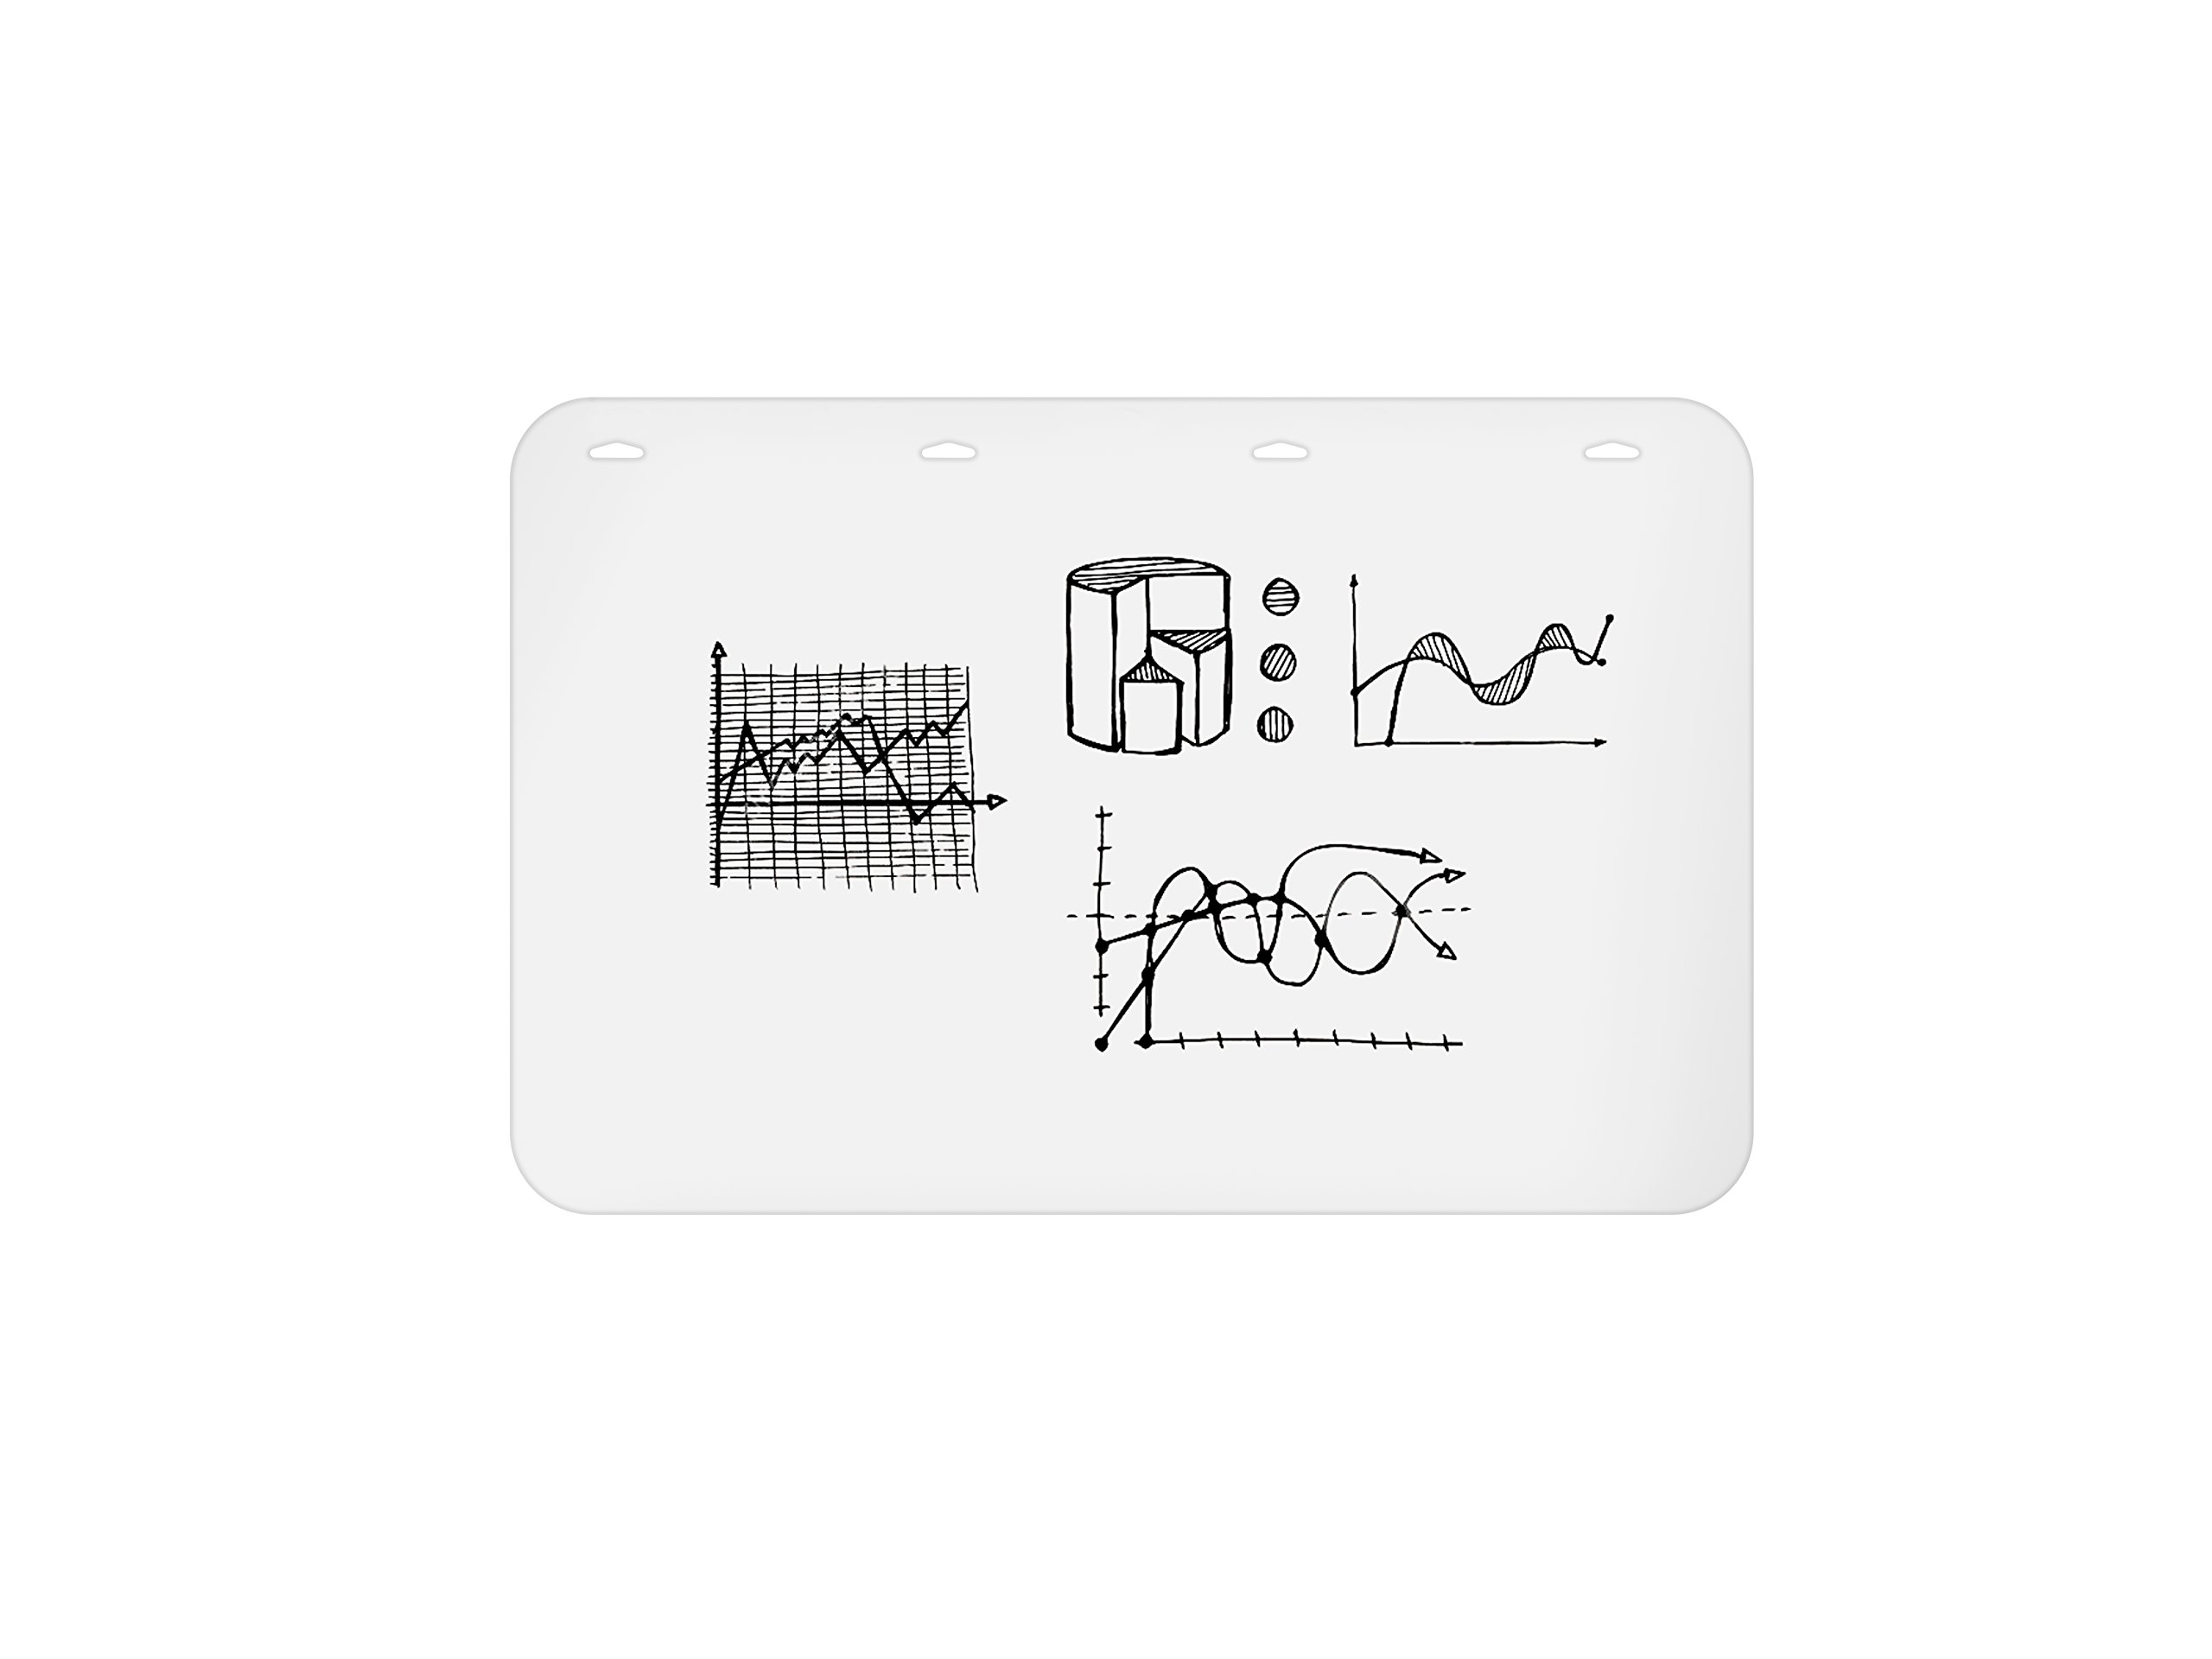 Rocada Rolled Polypropylene Whiteboard, Pack of 5, 35.5'' x 47'' x 0.02'' (RD-P2UV04)